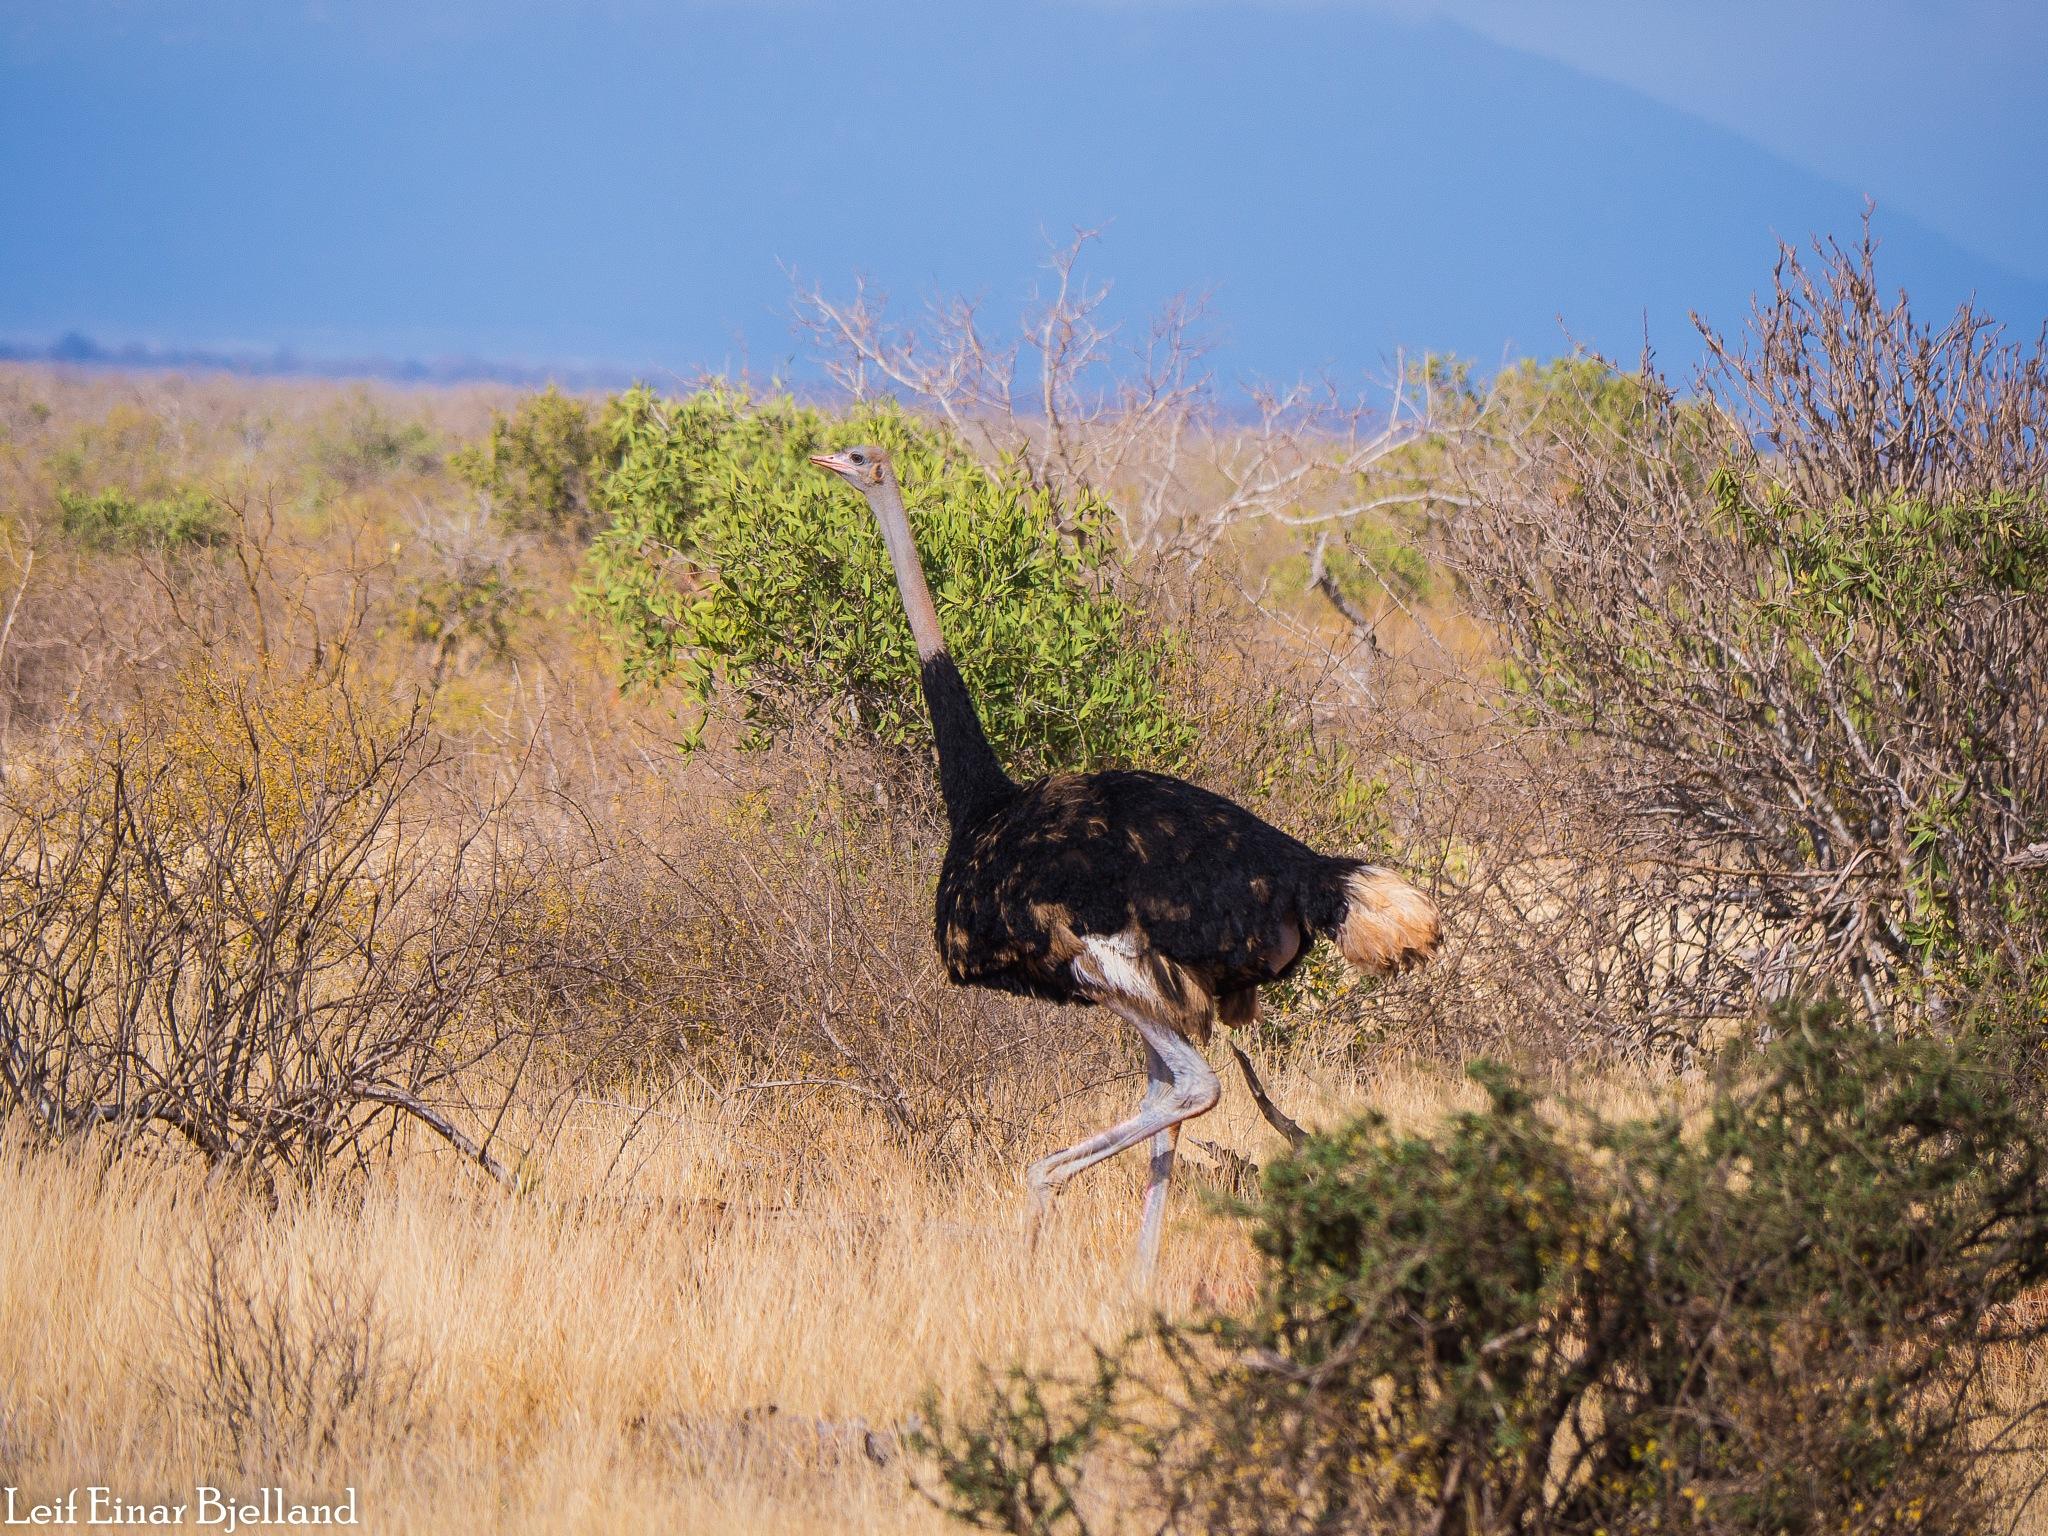 Ostrich by Leif Einar Bjelland